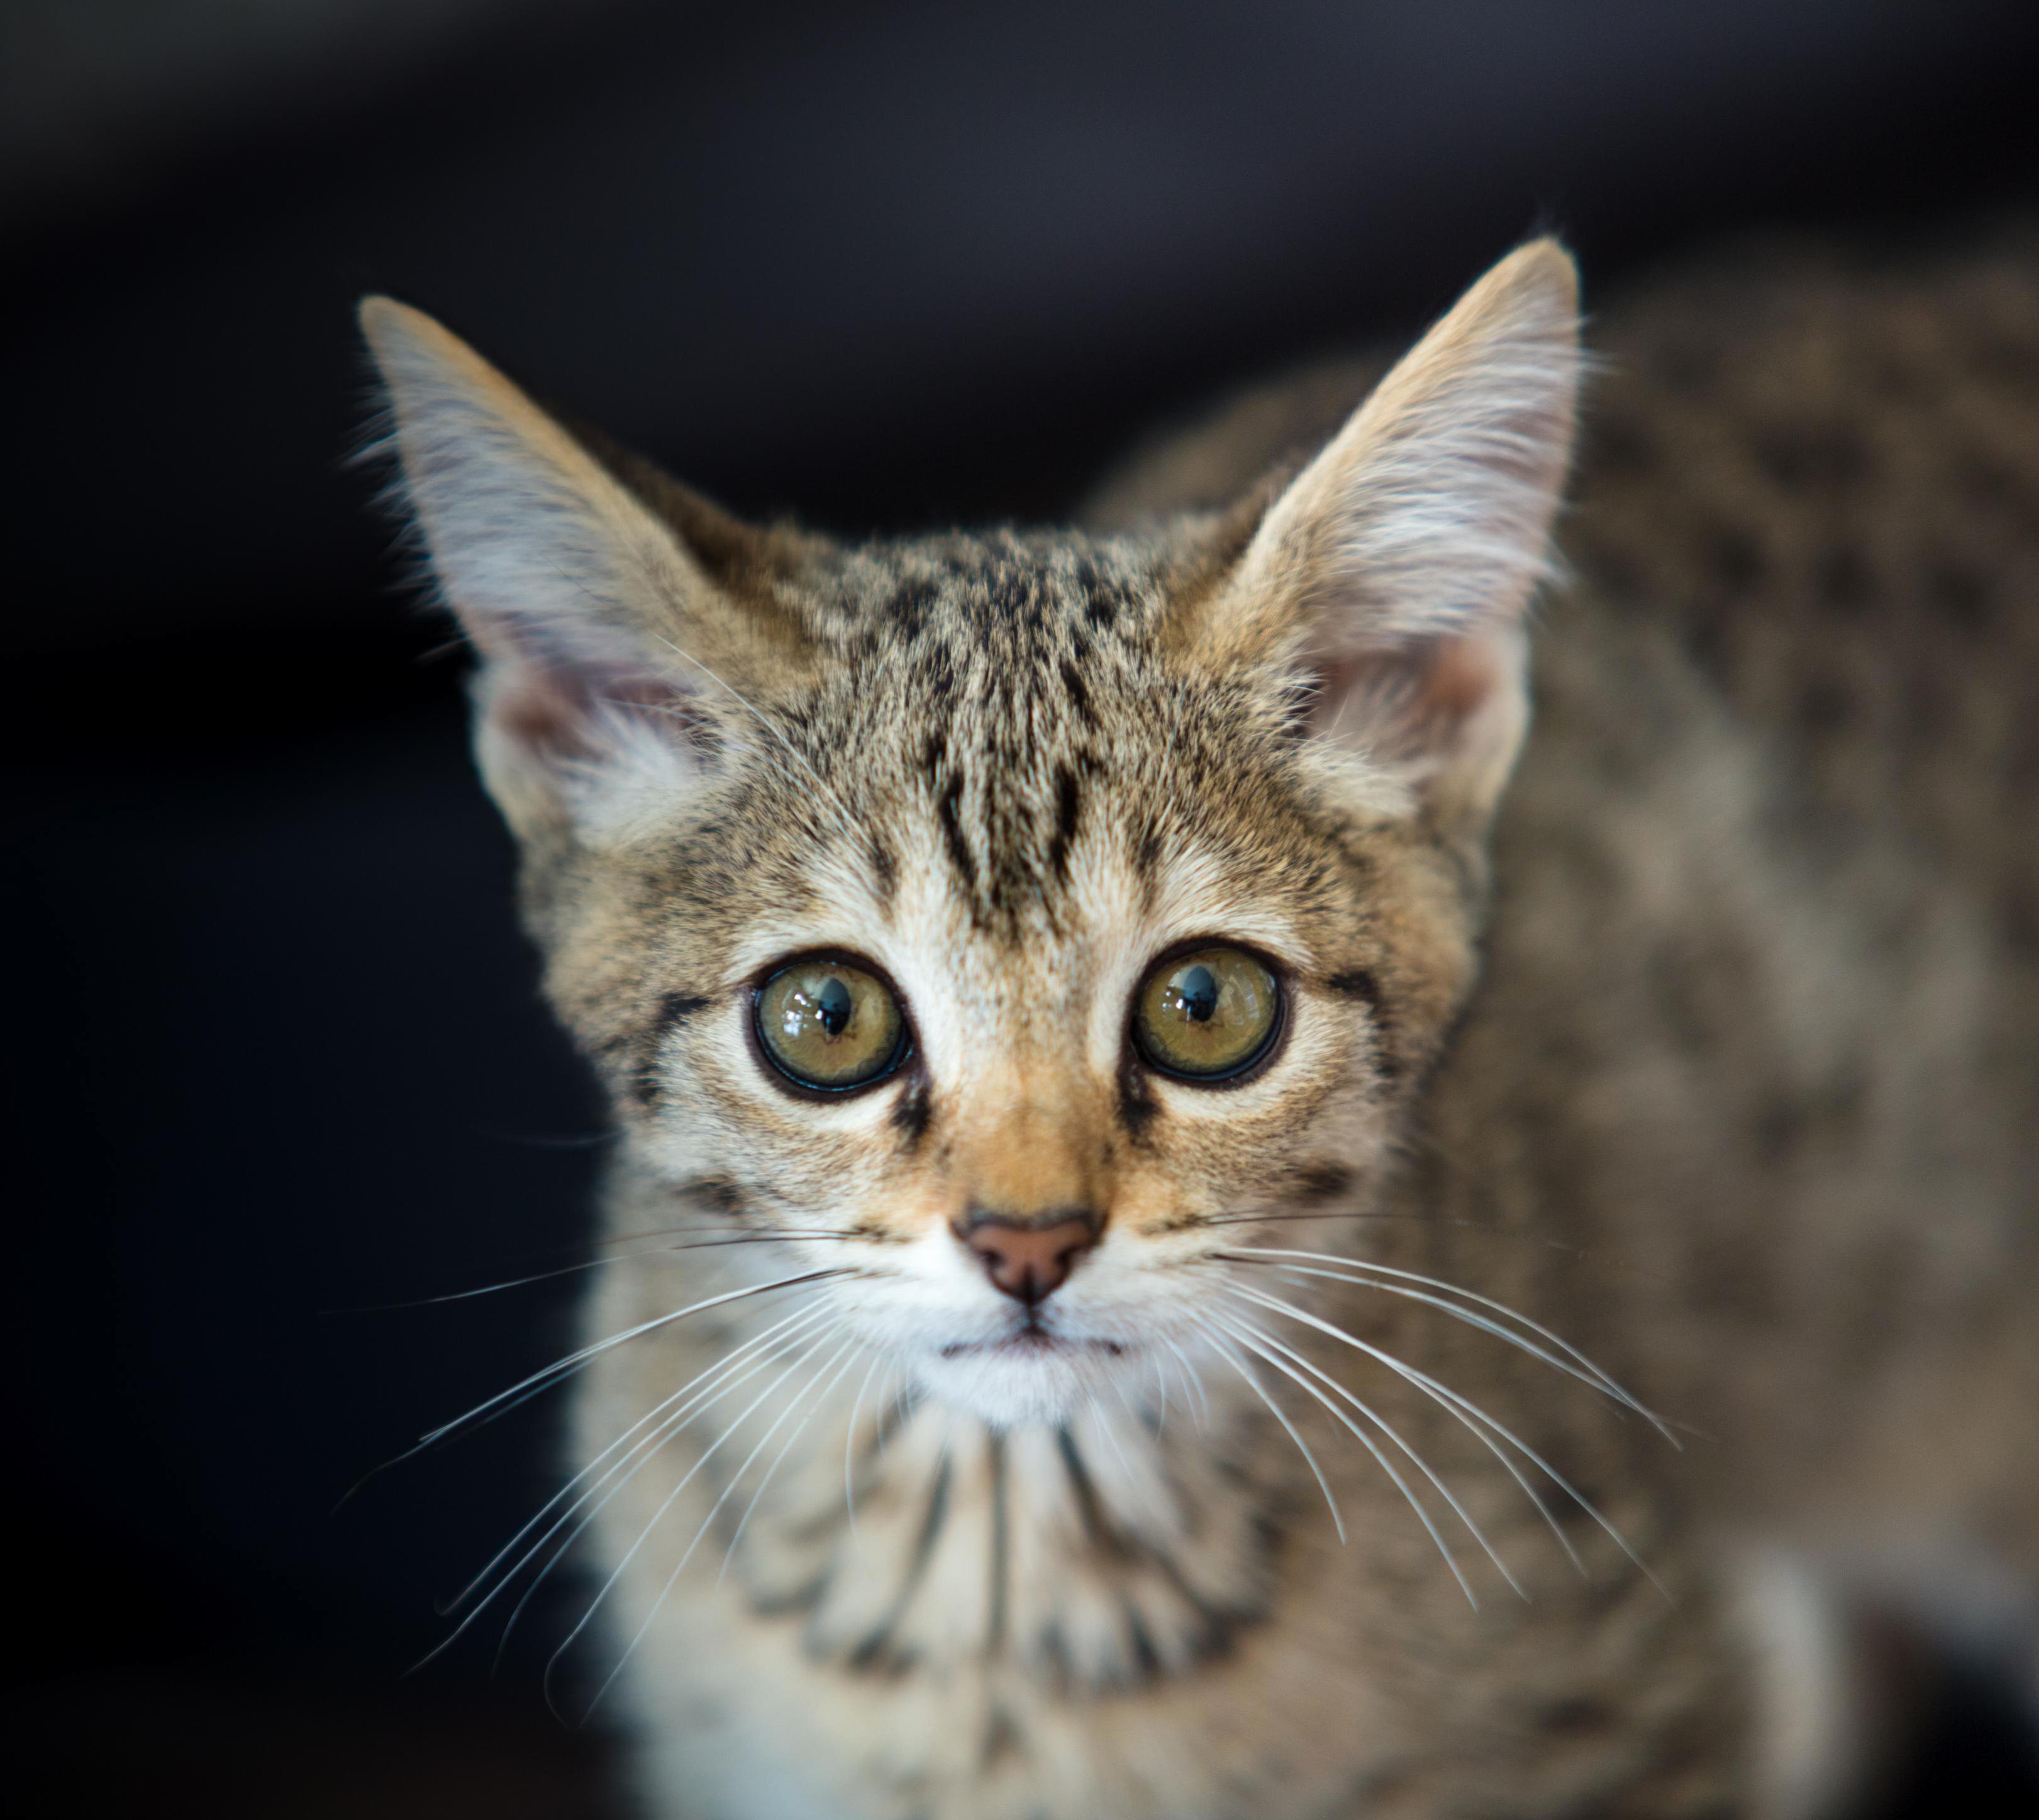 This is luna my f3 savannah kitten